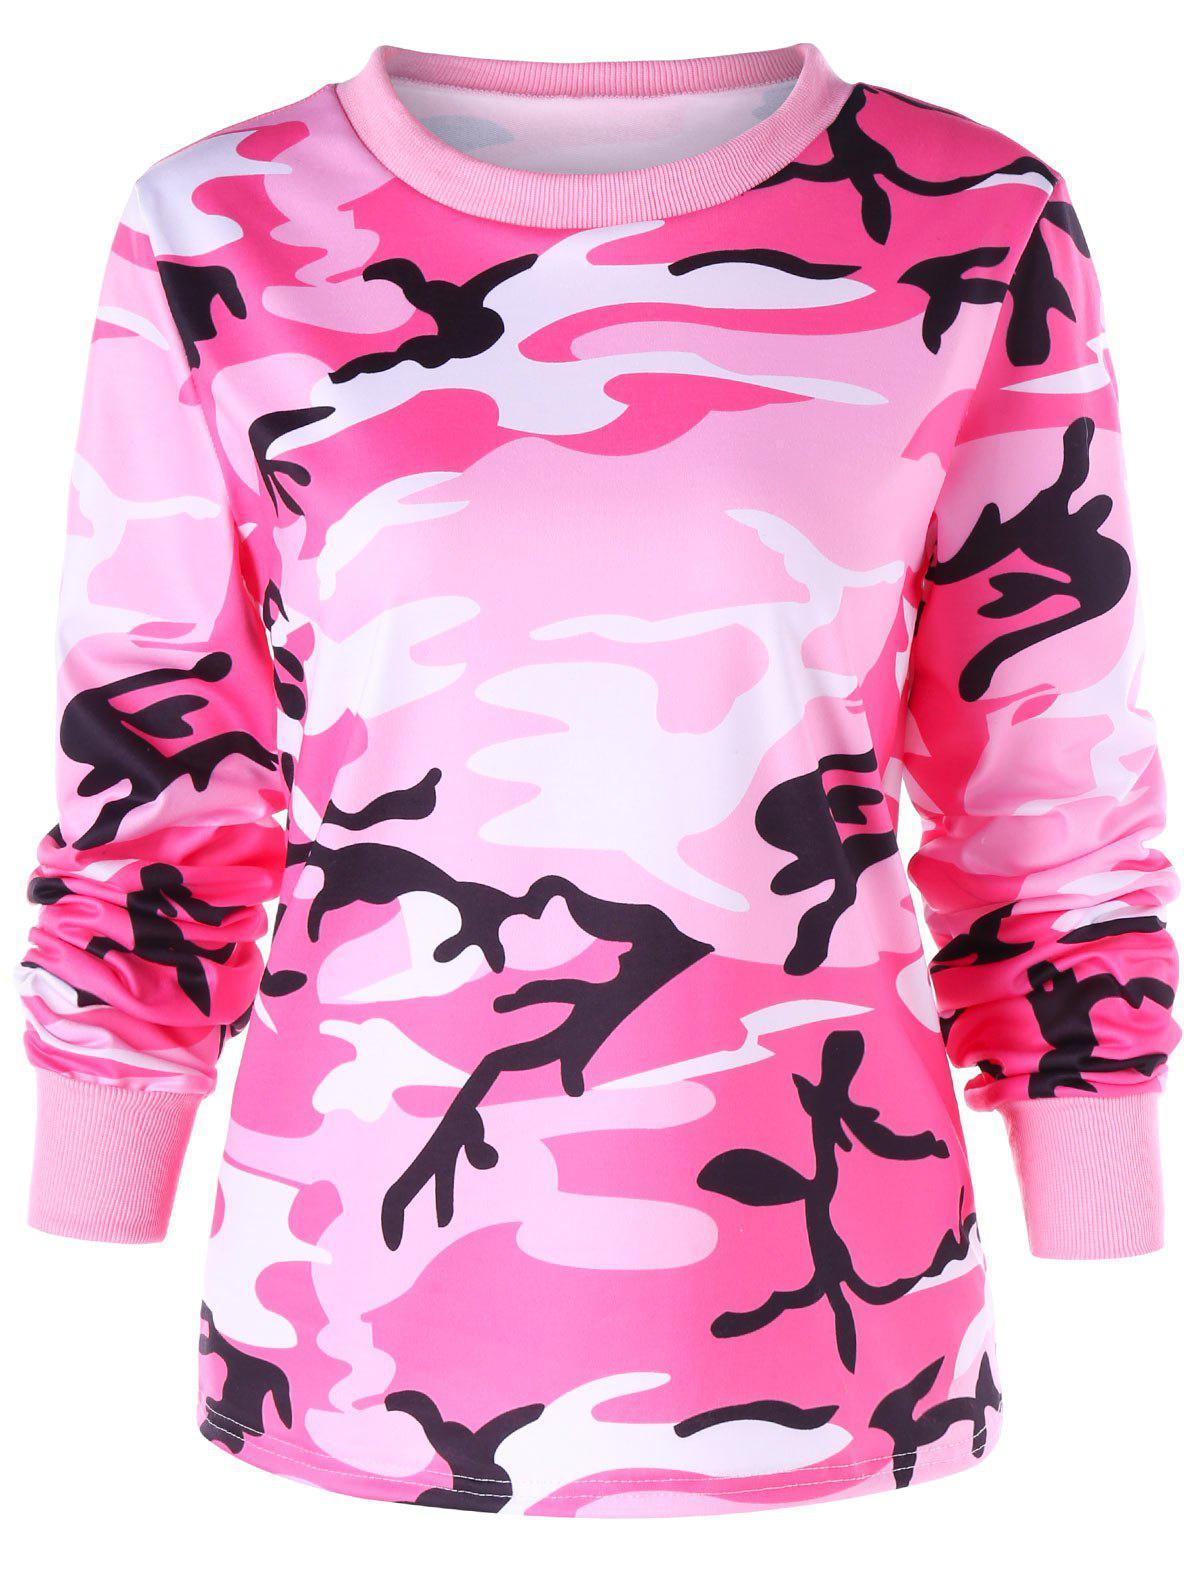 Ribbed Edge Camouflage Print Sweatshirt, Colormix